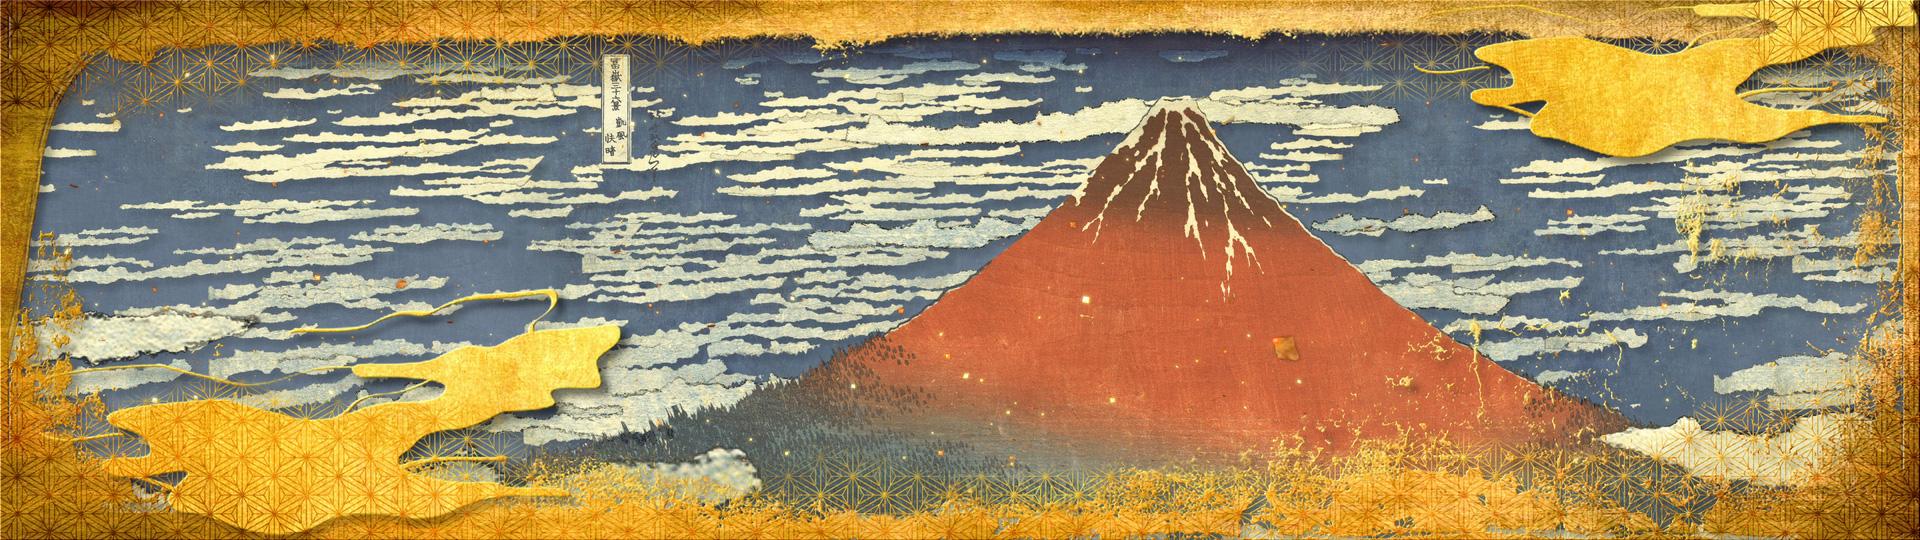 360° Around Mt. Fuji 〜NAKED meets 北斎〜|成田国際空港第1・第2ターミナル到着コンコースエリア